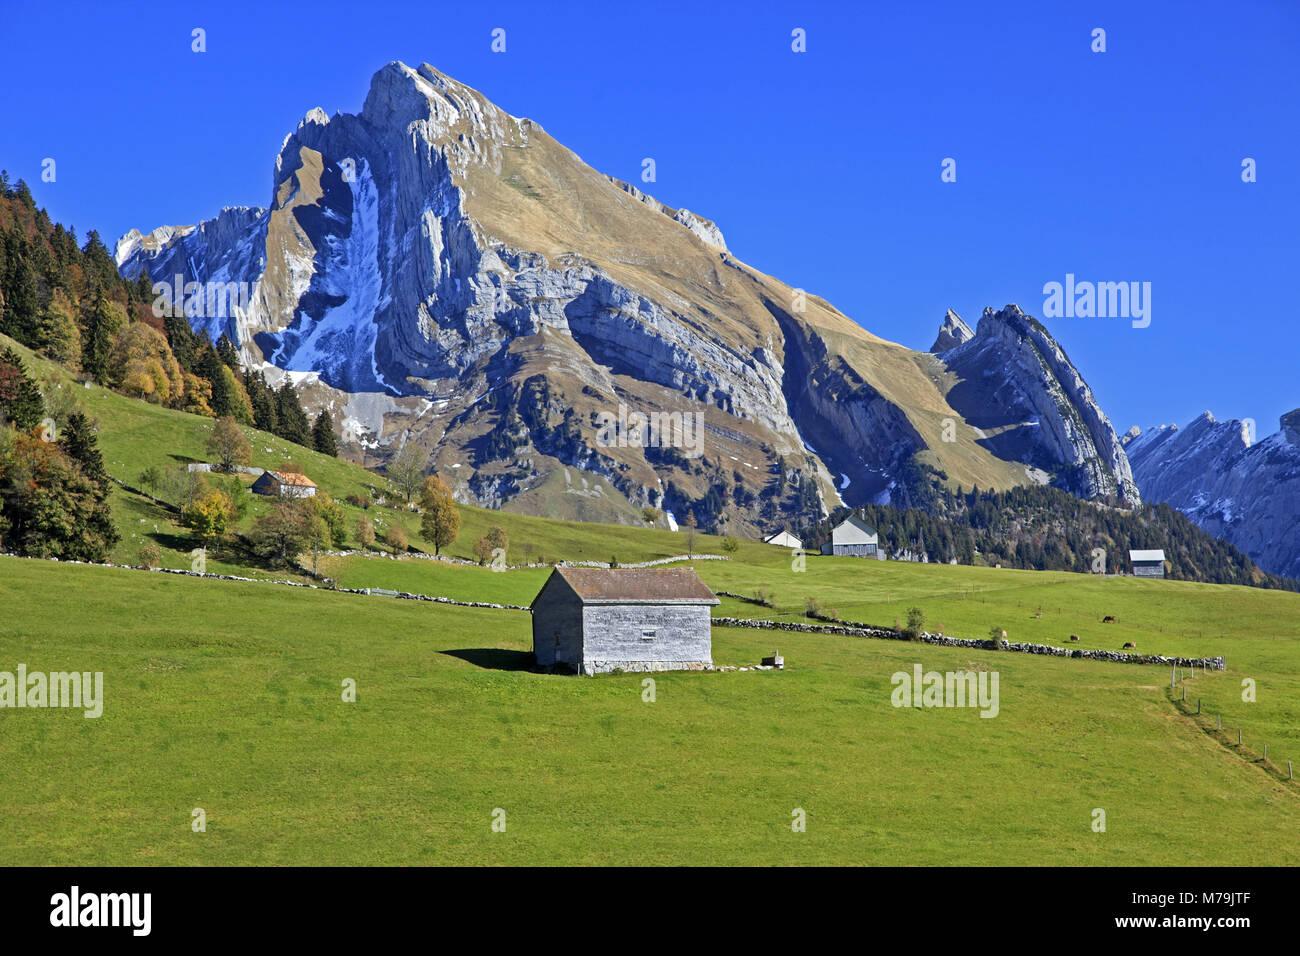 Schweiz, Schweizer Alpen, Appenzell, St. Gallen, Altmann, Alpstein Massivs, Stockbild